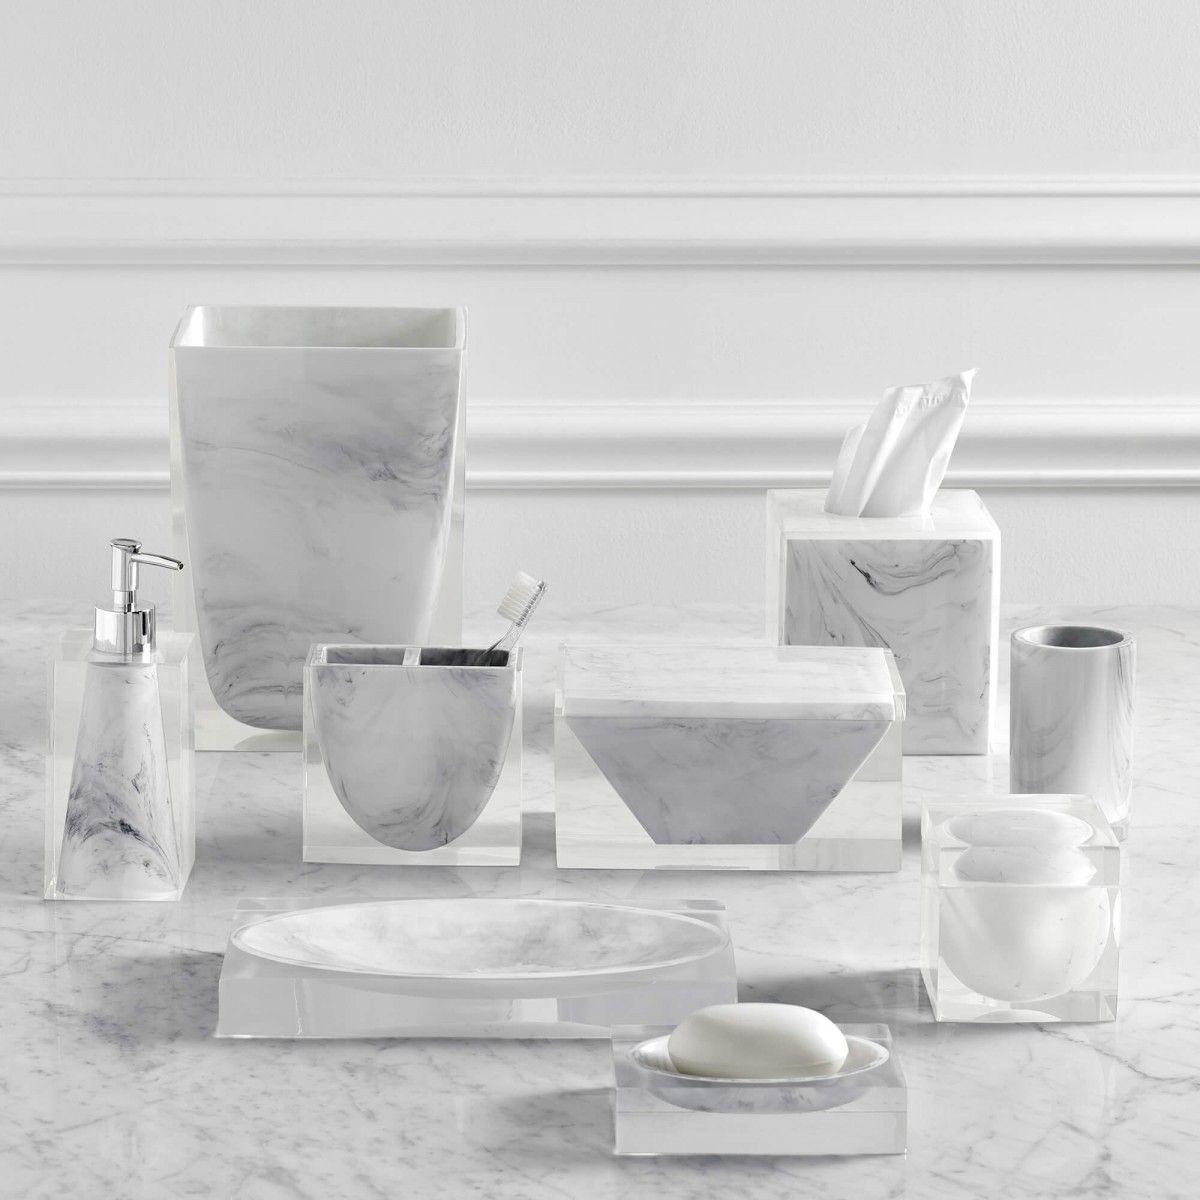 Ducale White Bath Accessories Modern Bathroom Accessories Marble Bathroom Accessories Bathroom Accessories Luxury